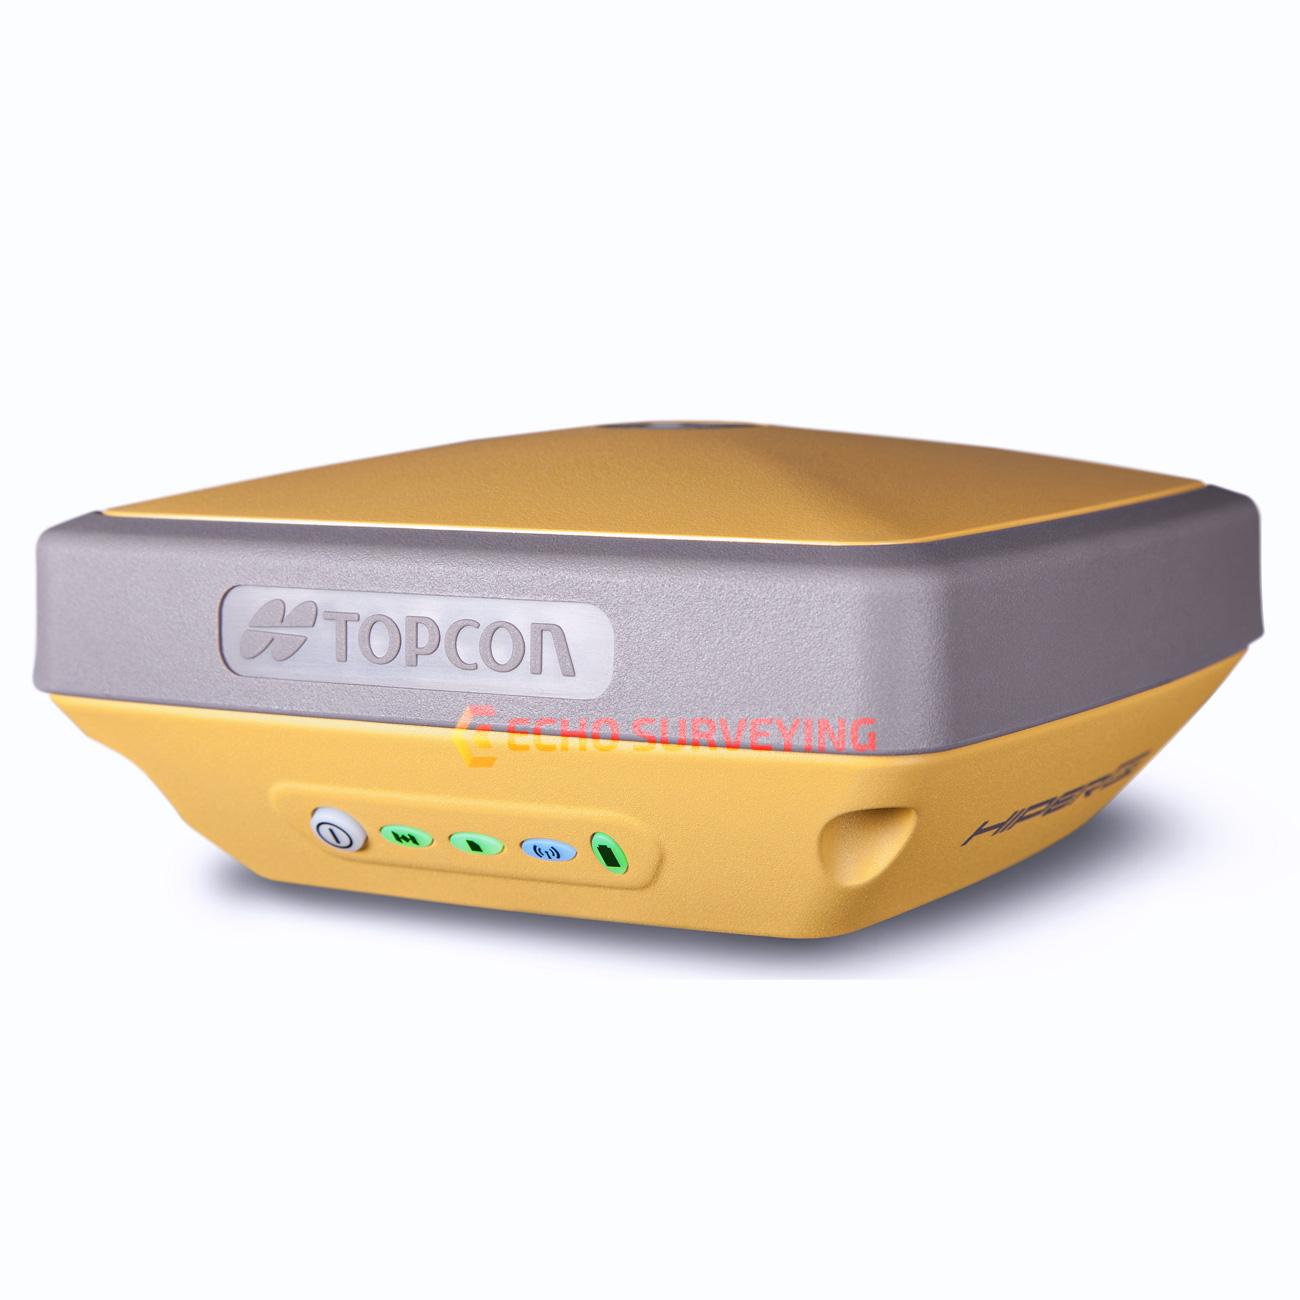 HiPer-SR-Receiver.jpg